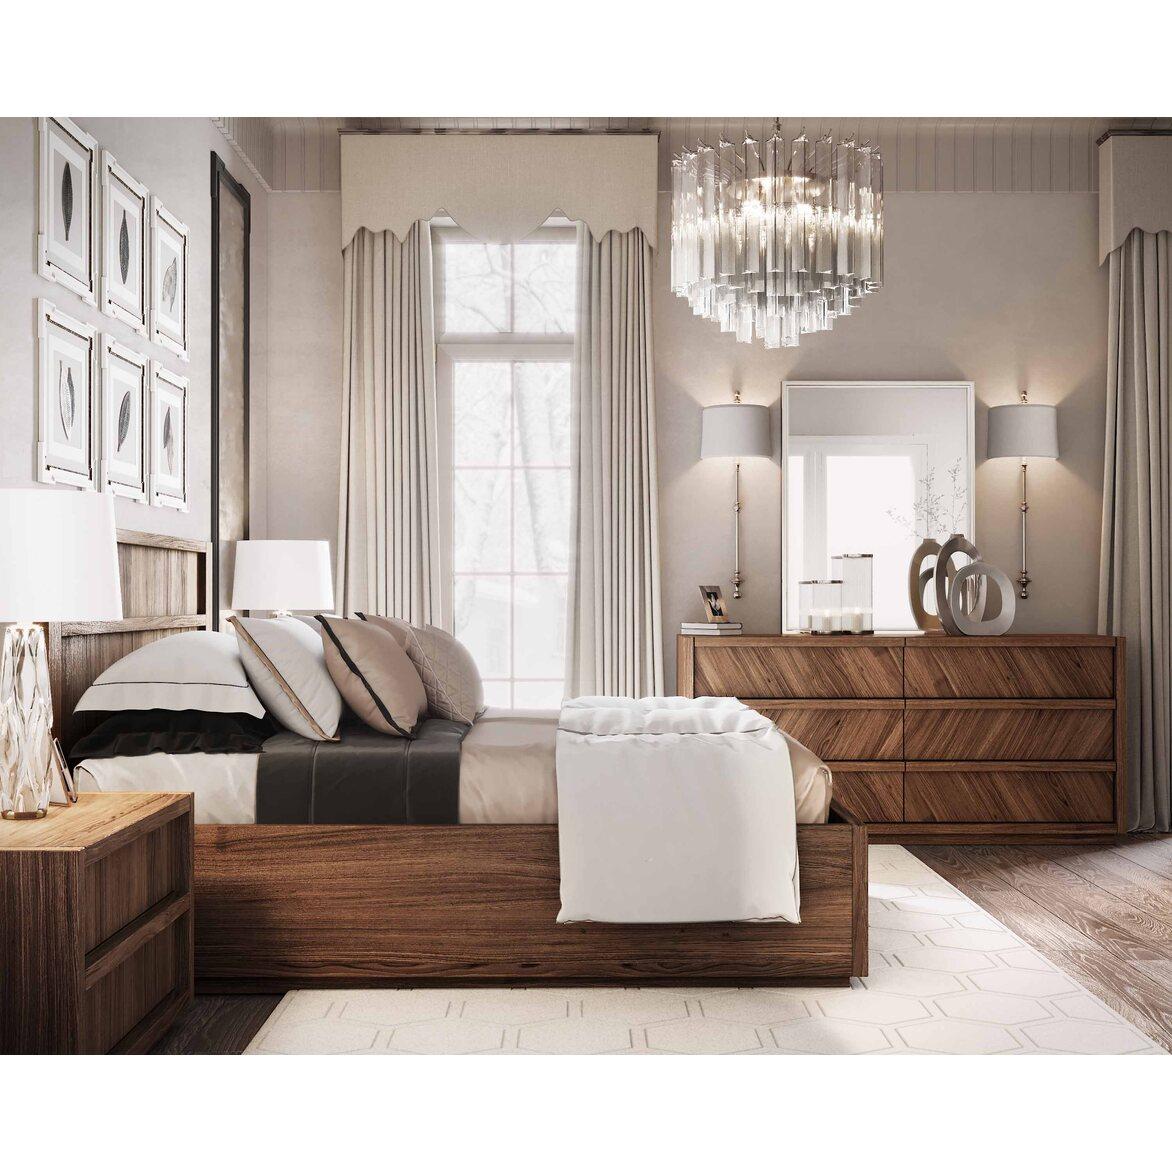 "Кровать 160*200 ""Brenson"" 6 | Двуспальные кровати Kingsby"